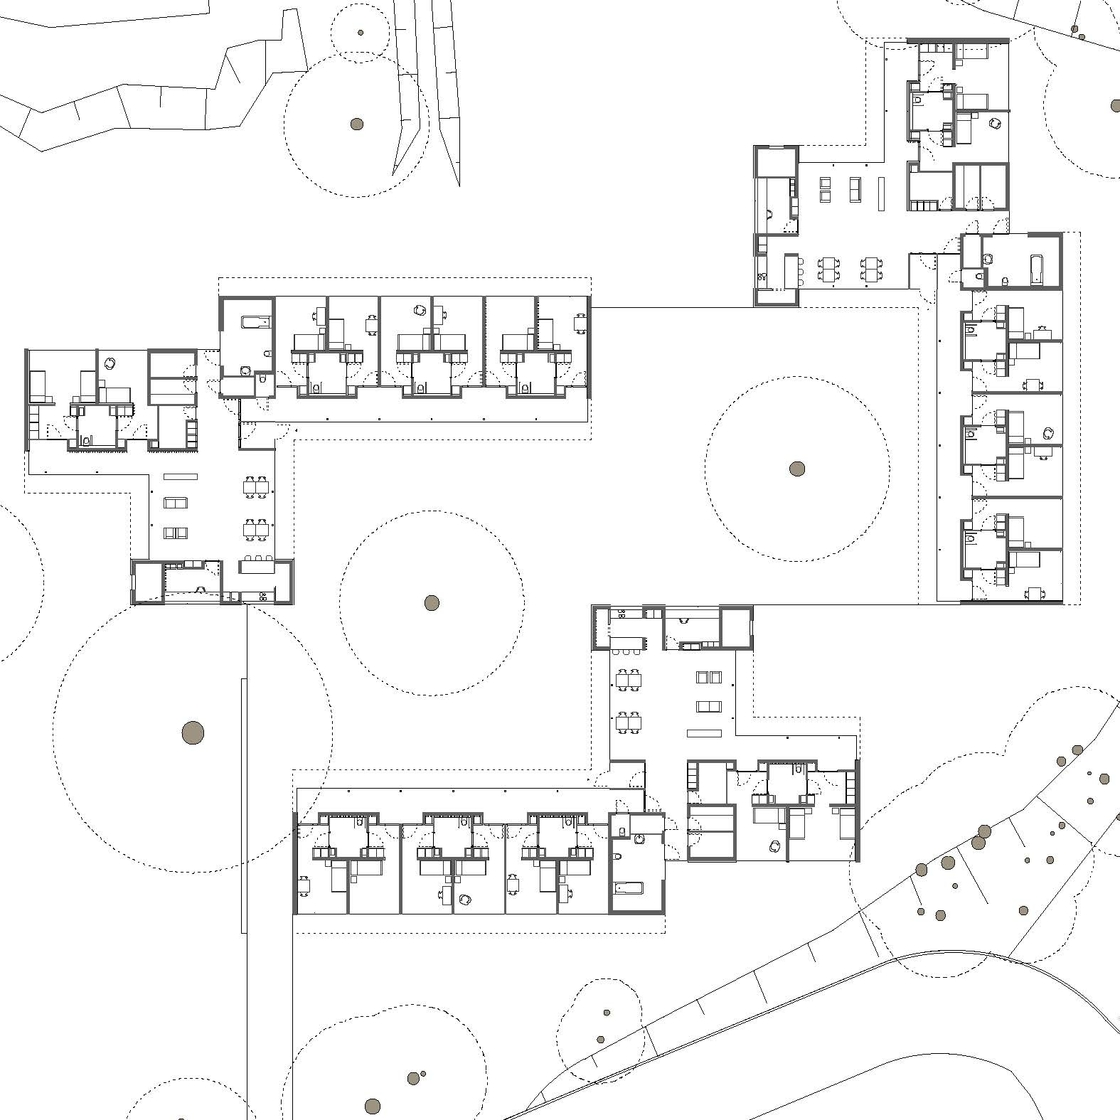 Kinderhäuser St. Vincenzstift Grundriss